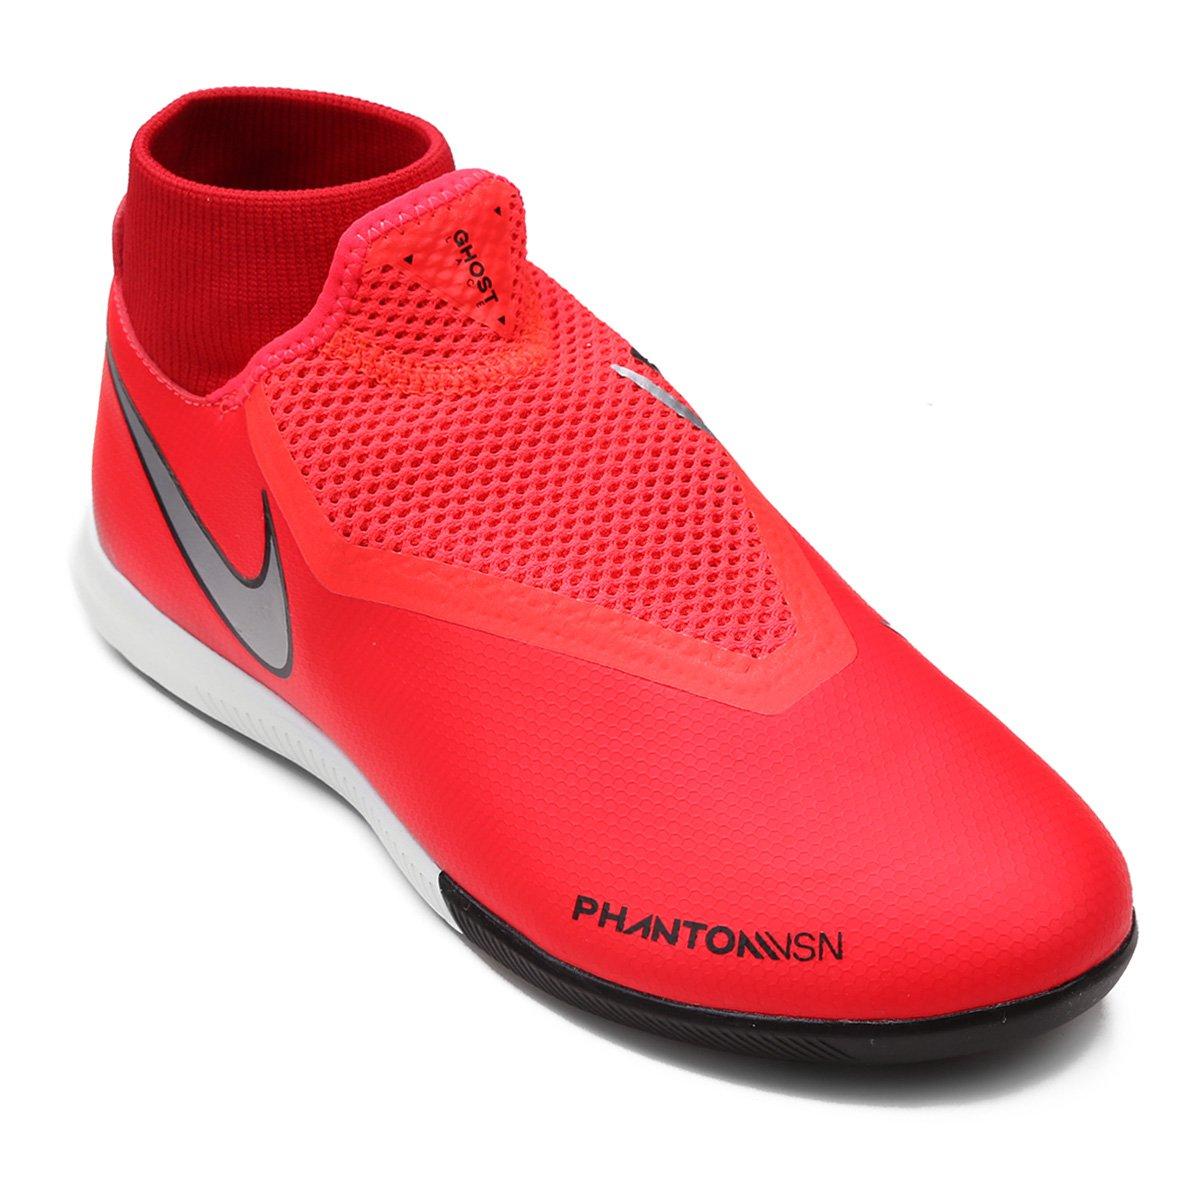 0c5c8fac96 Chuteira Futsal Nike Phantom Vision Academy DF IC - Vermelho e Prata ...